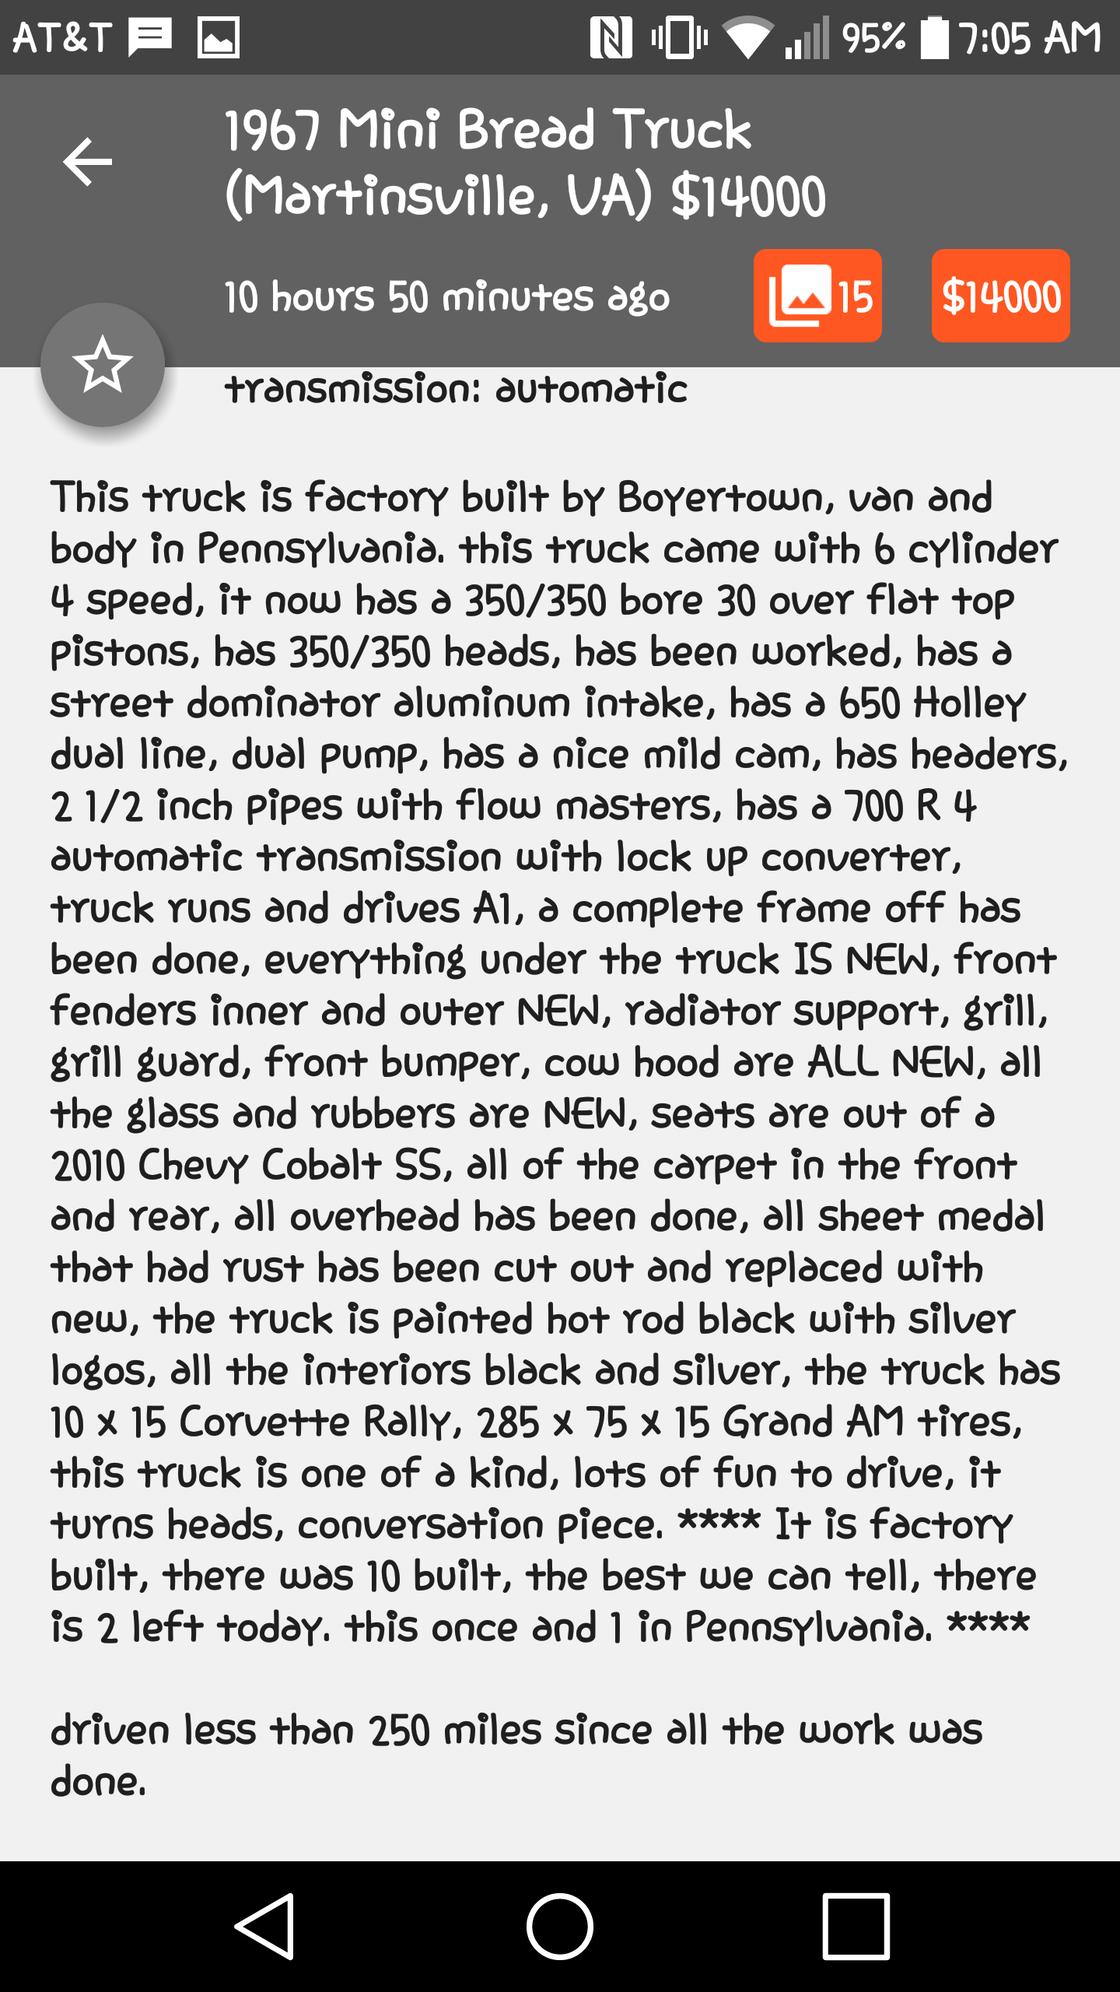 craigslist ebay funny listings or good deals go here page 1134 jeep cherokee forum. Black Bedroom Furniture Sets. Home Design Ideas